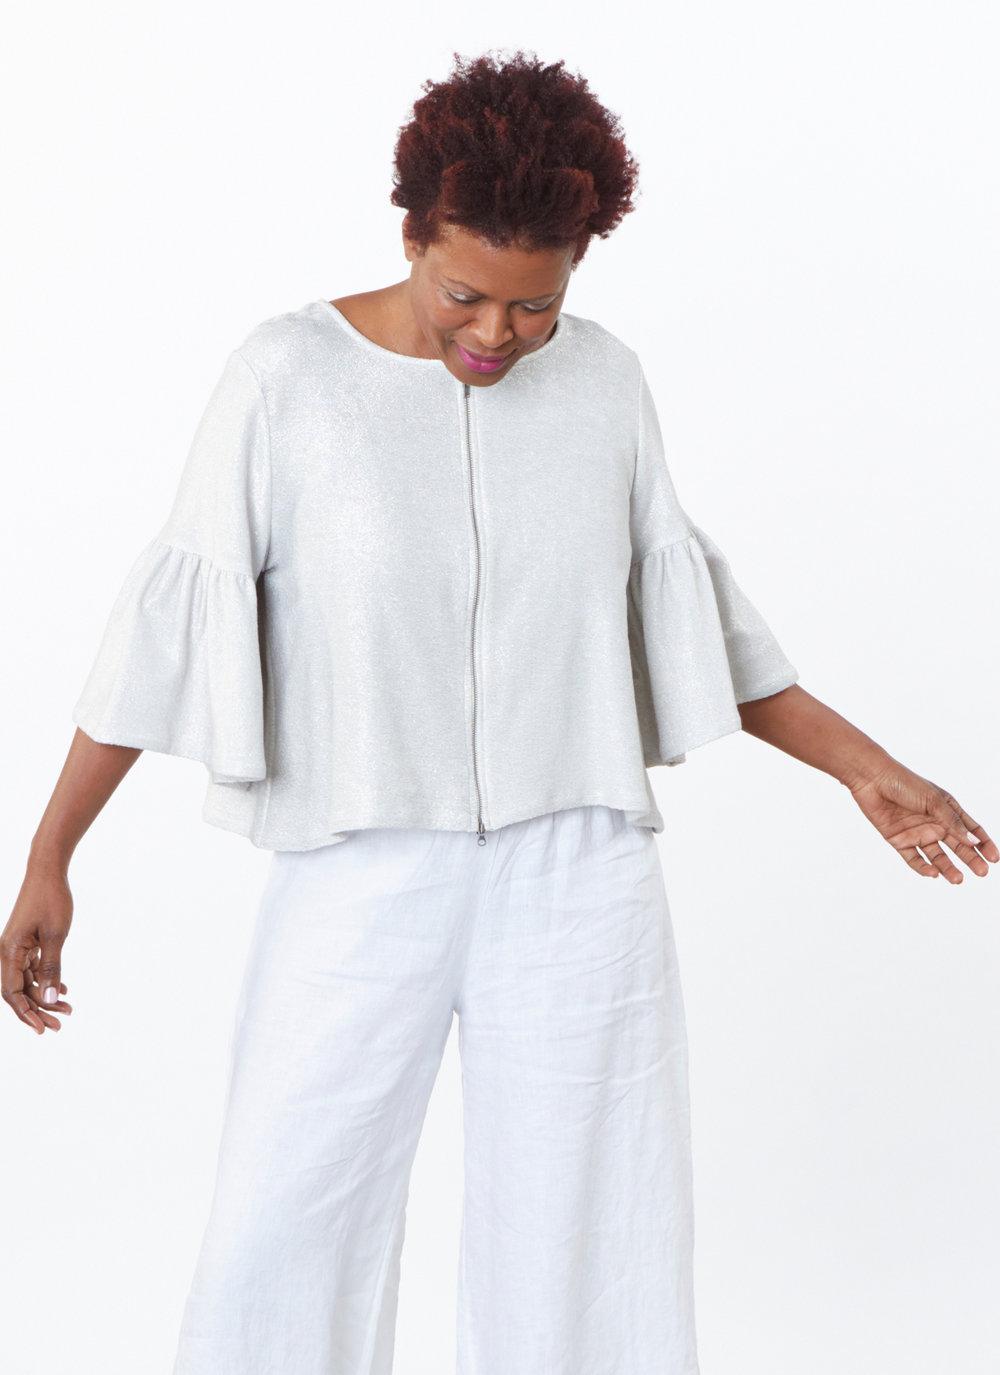 Frida Zip Jacket in Silver Ready for Newport Beach, Long Full Pant in White Light Linen